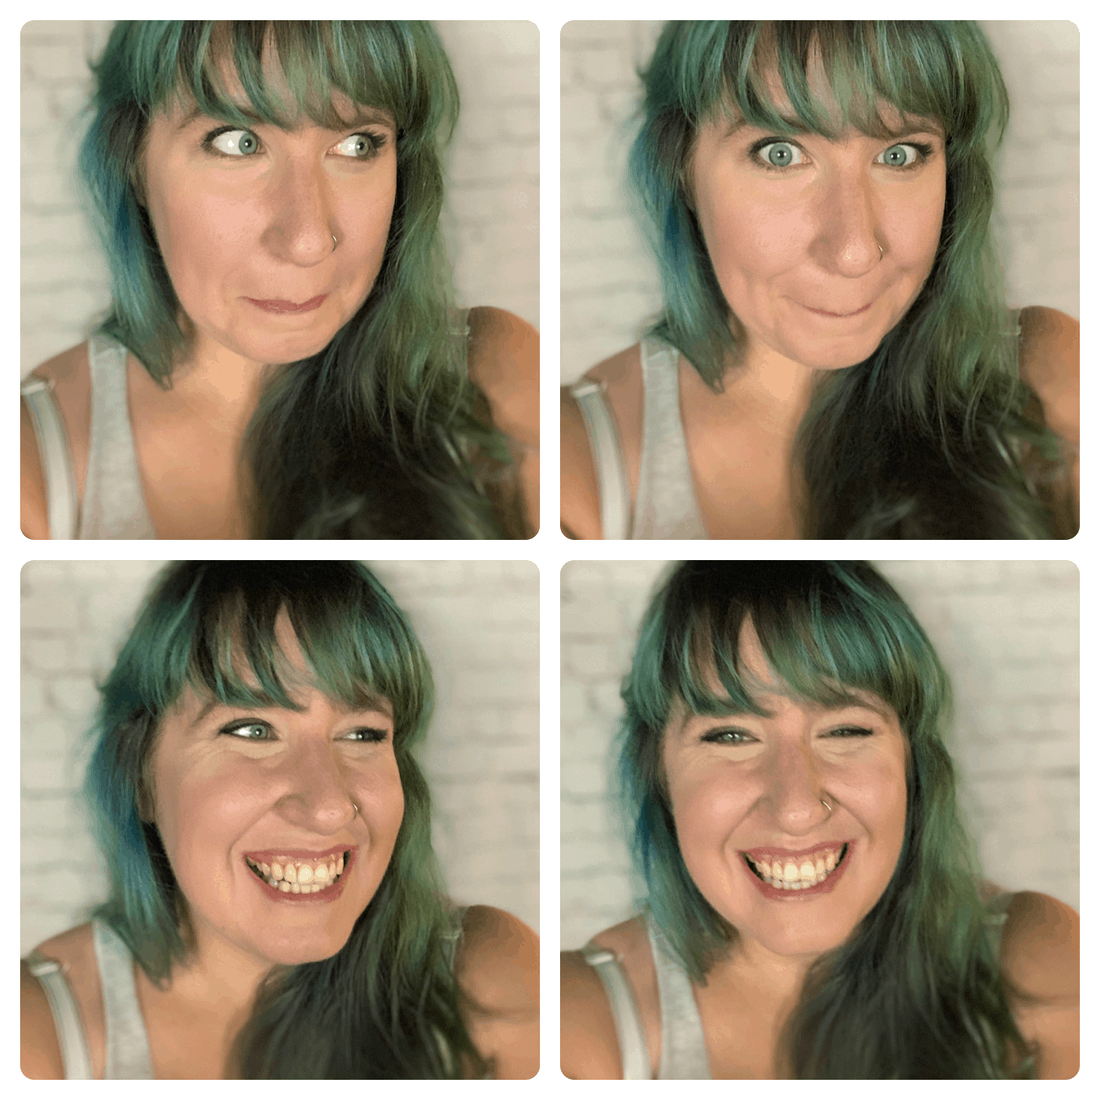 semi-permanent hair dye tips